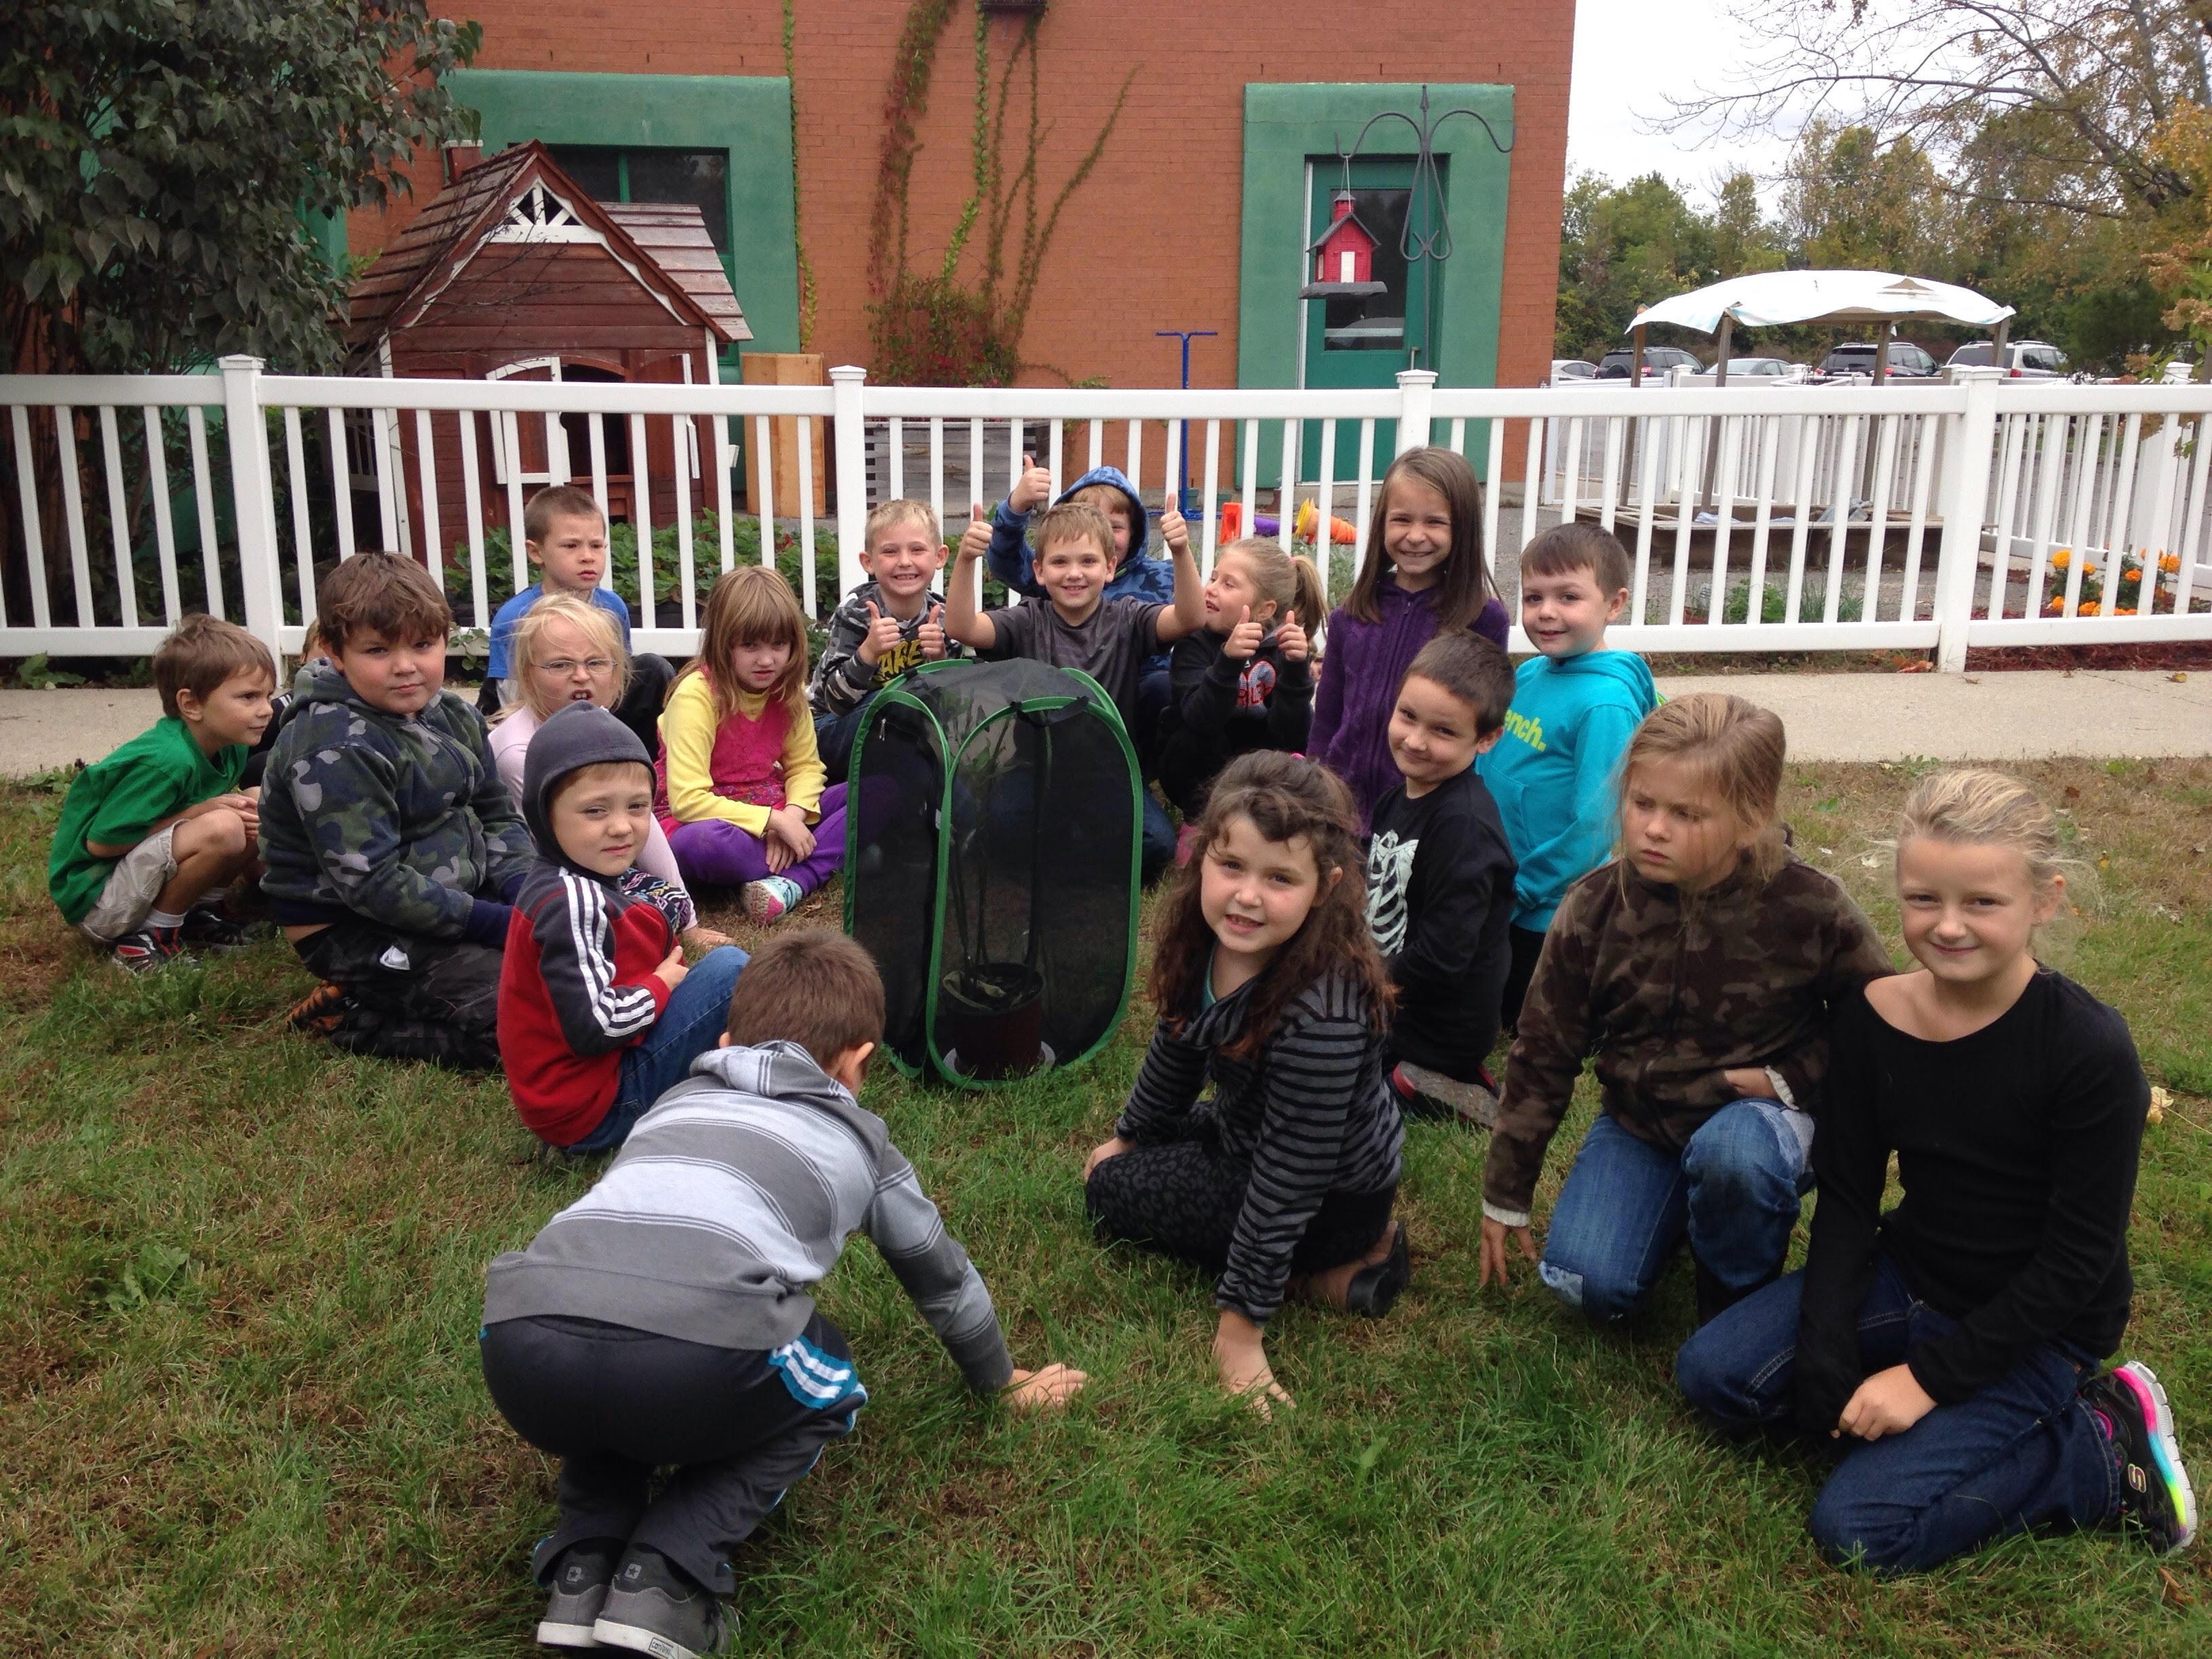 J.J. O'Neill school kids with aviary